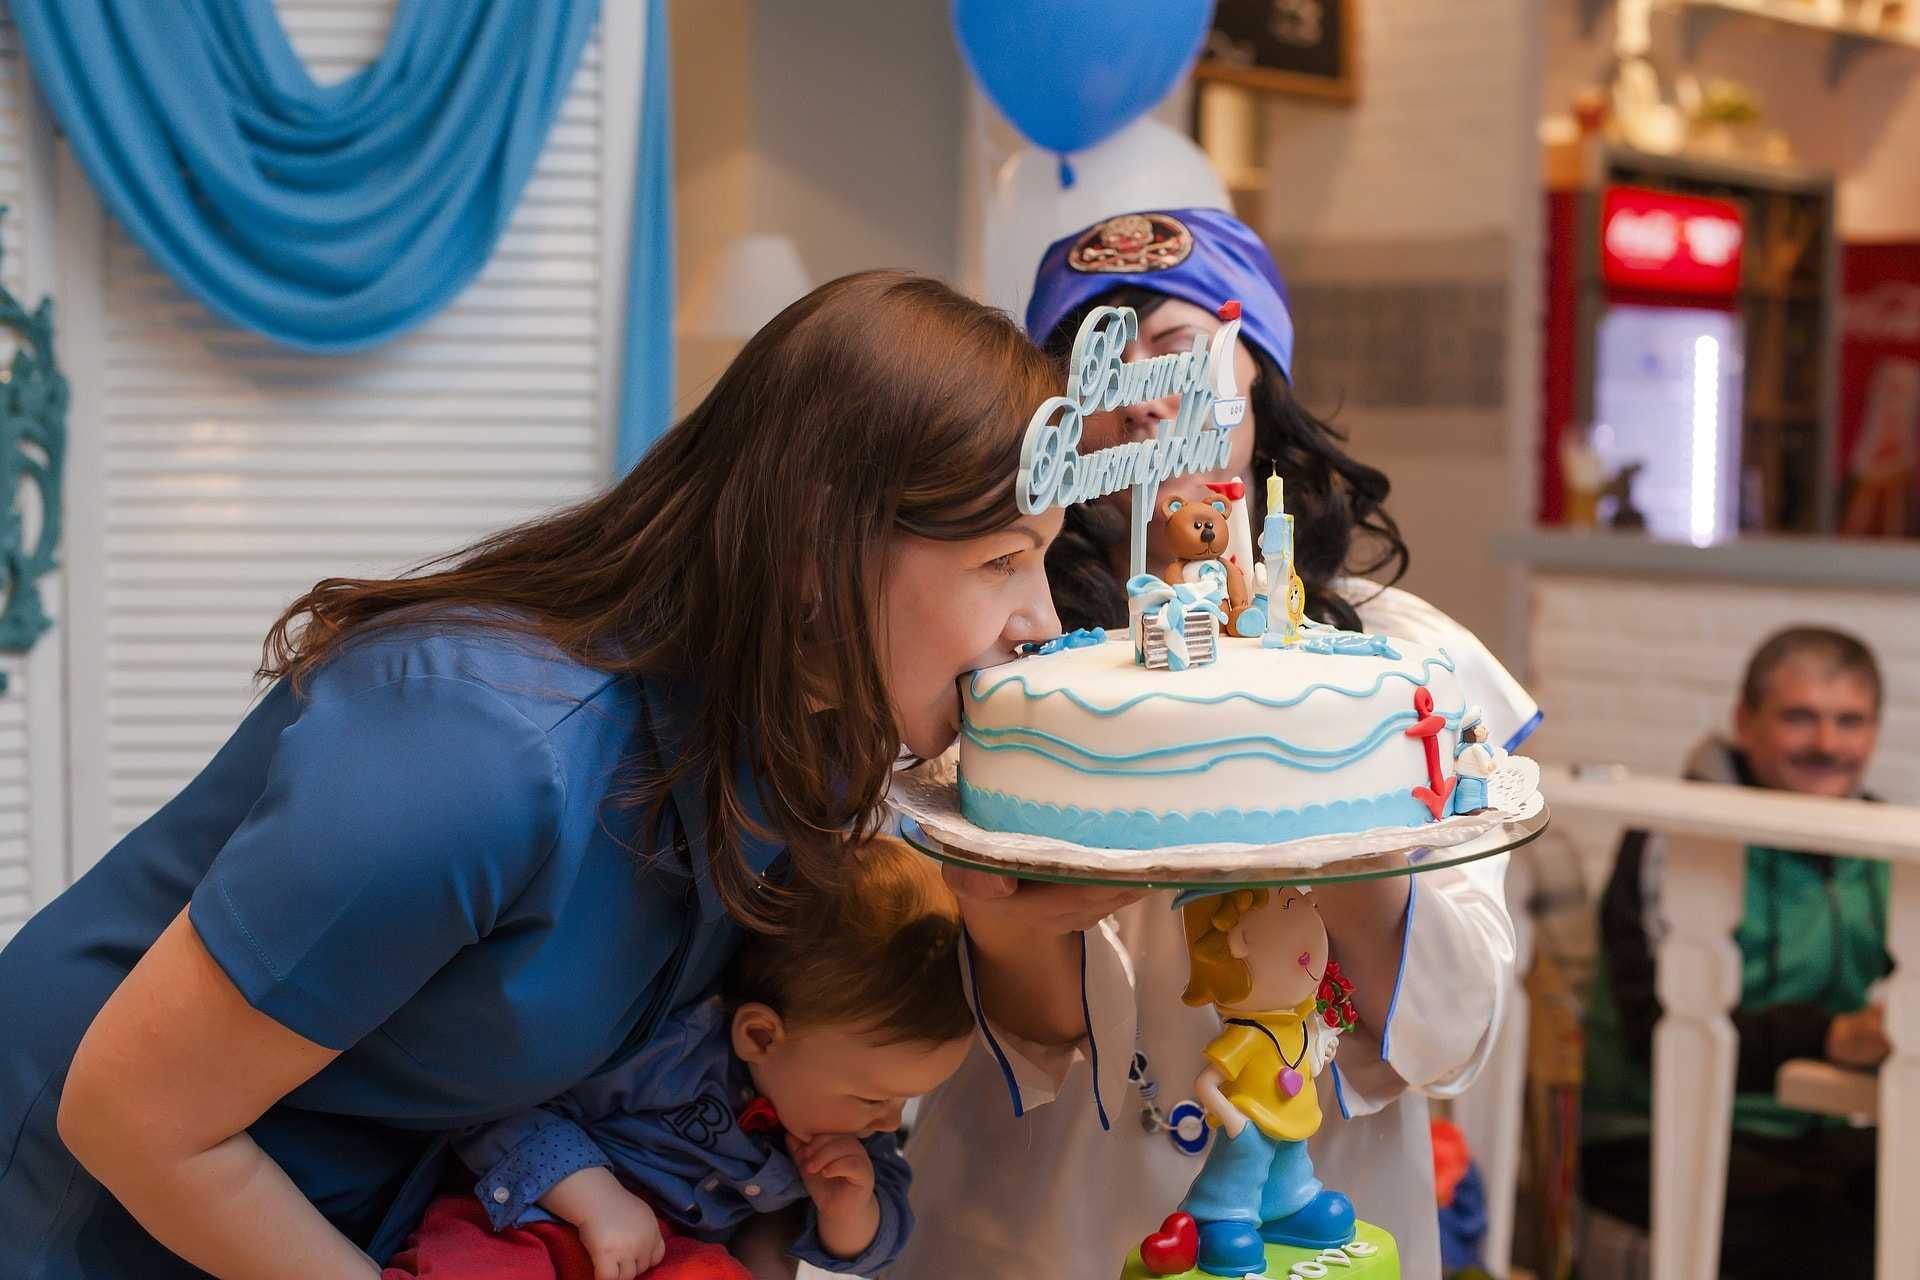 cake 1571747 1920 min